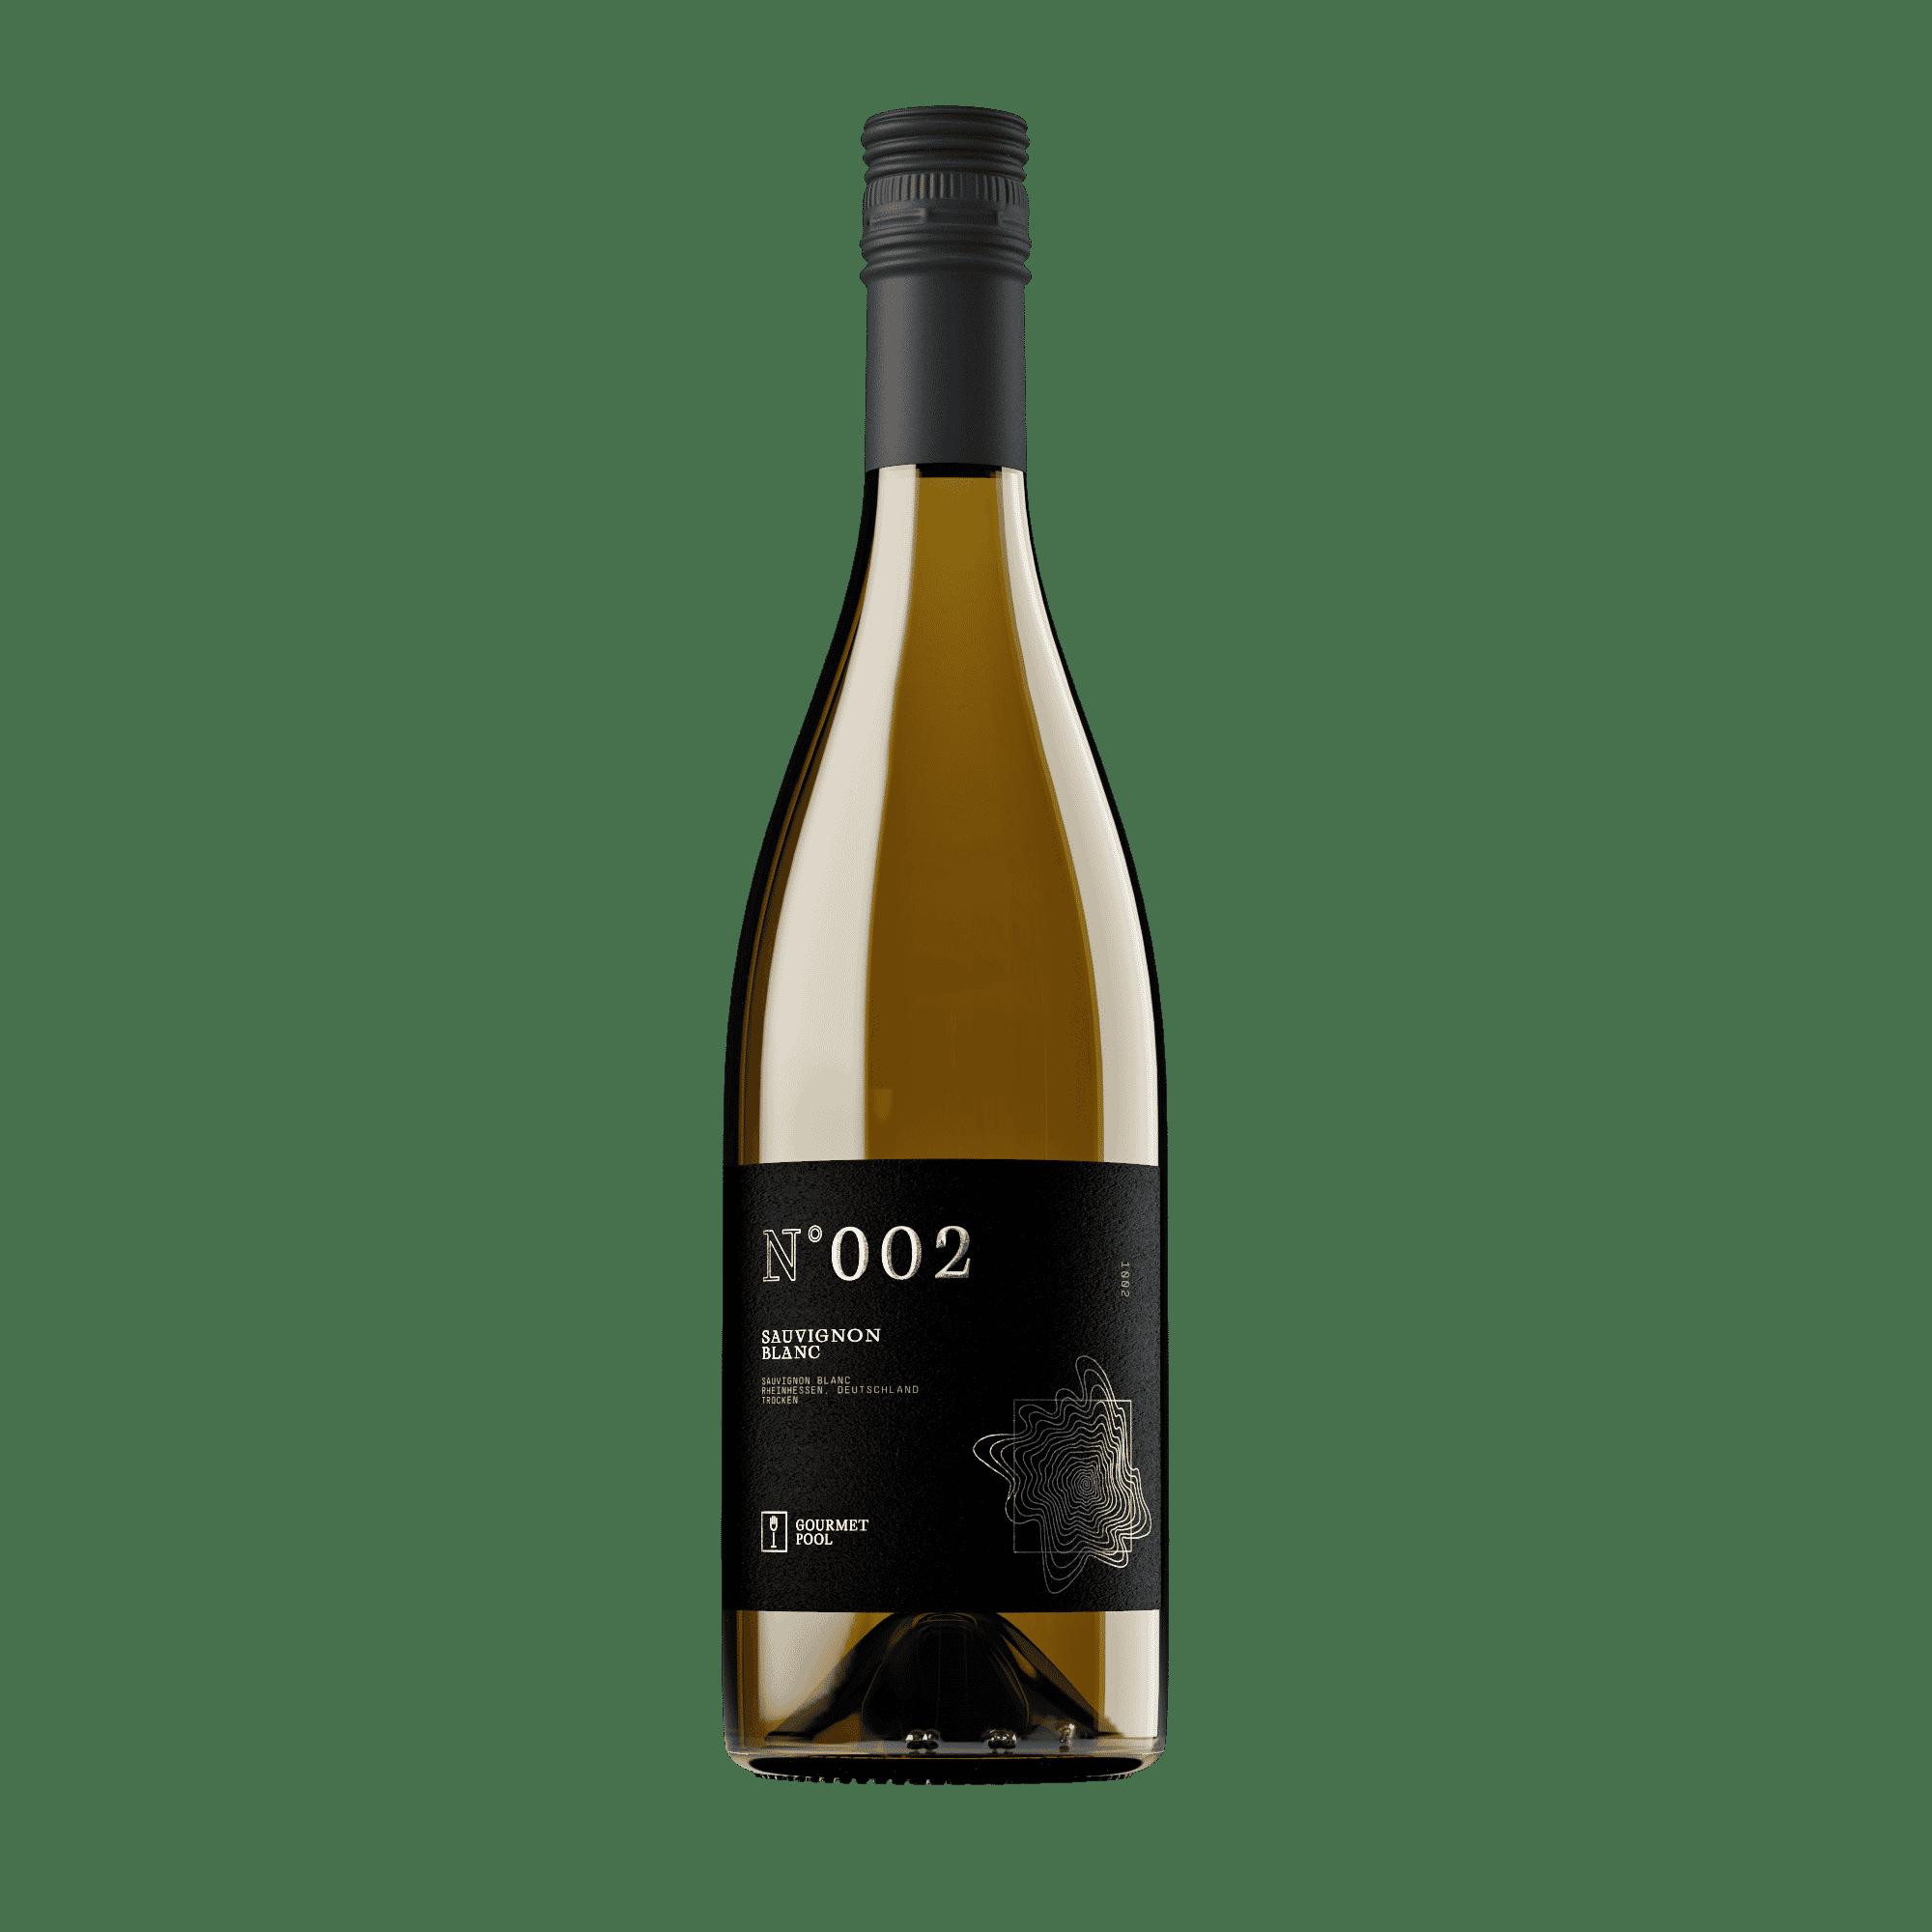 N°002 Sauvignon Blanc